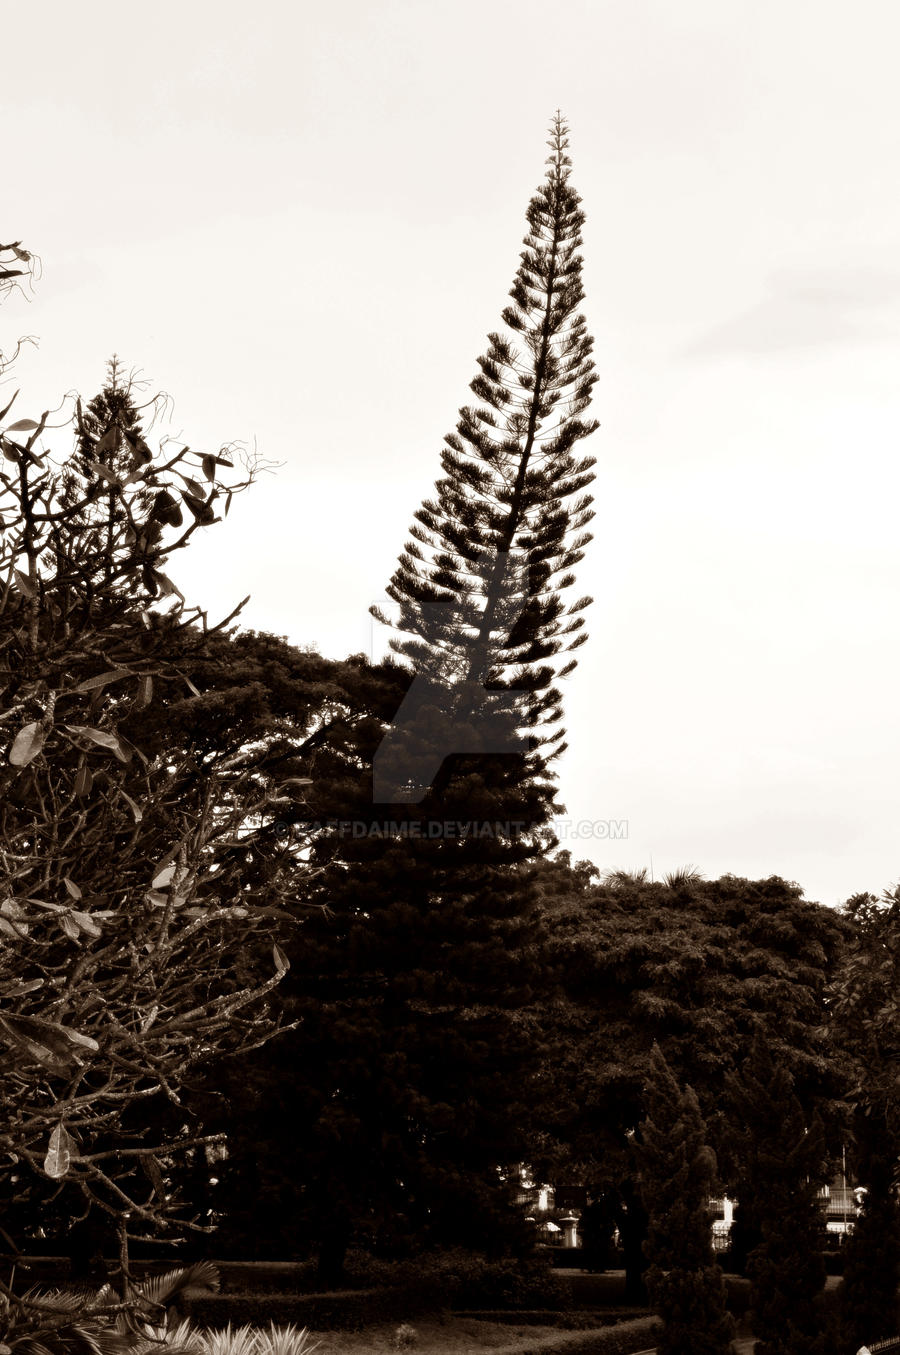 The Tree by raffdaime